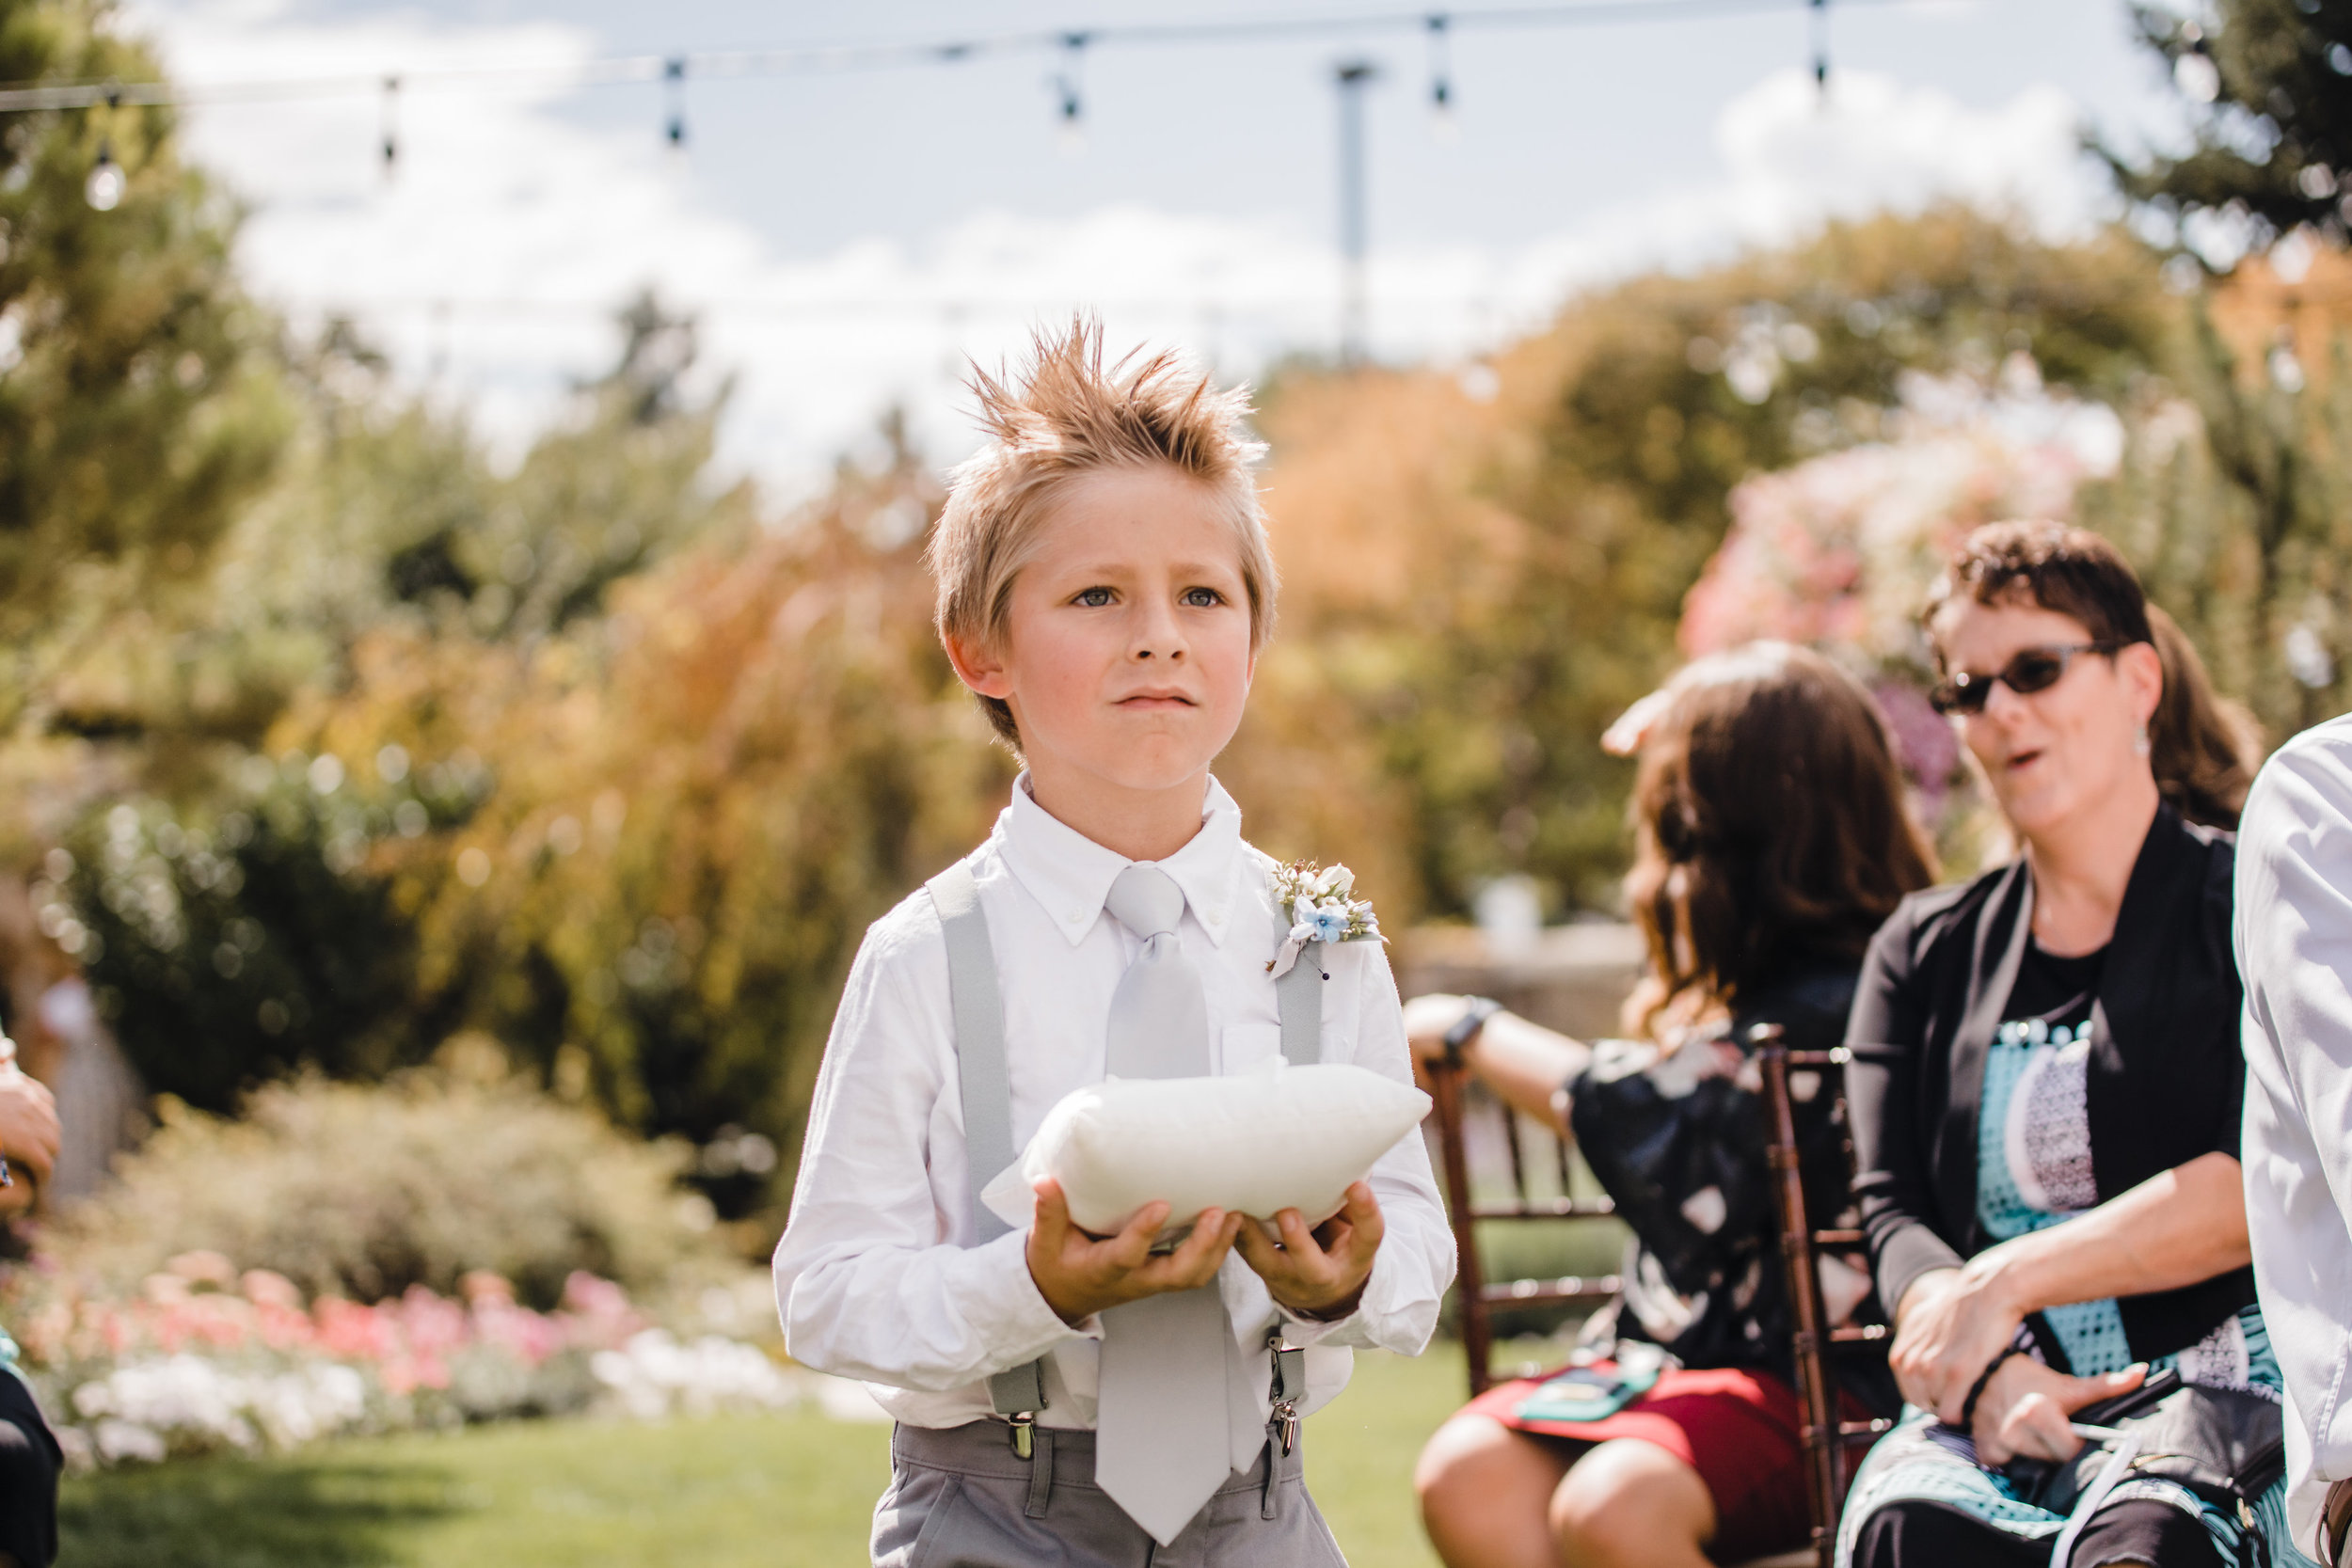 utah valley wedding photographer outdoor wedding ceremony ring bearer string lights